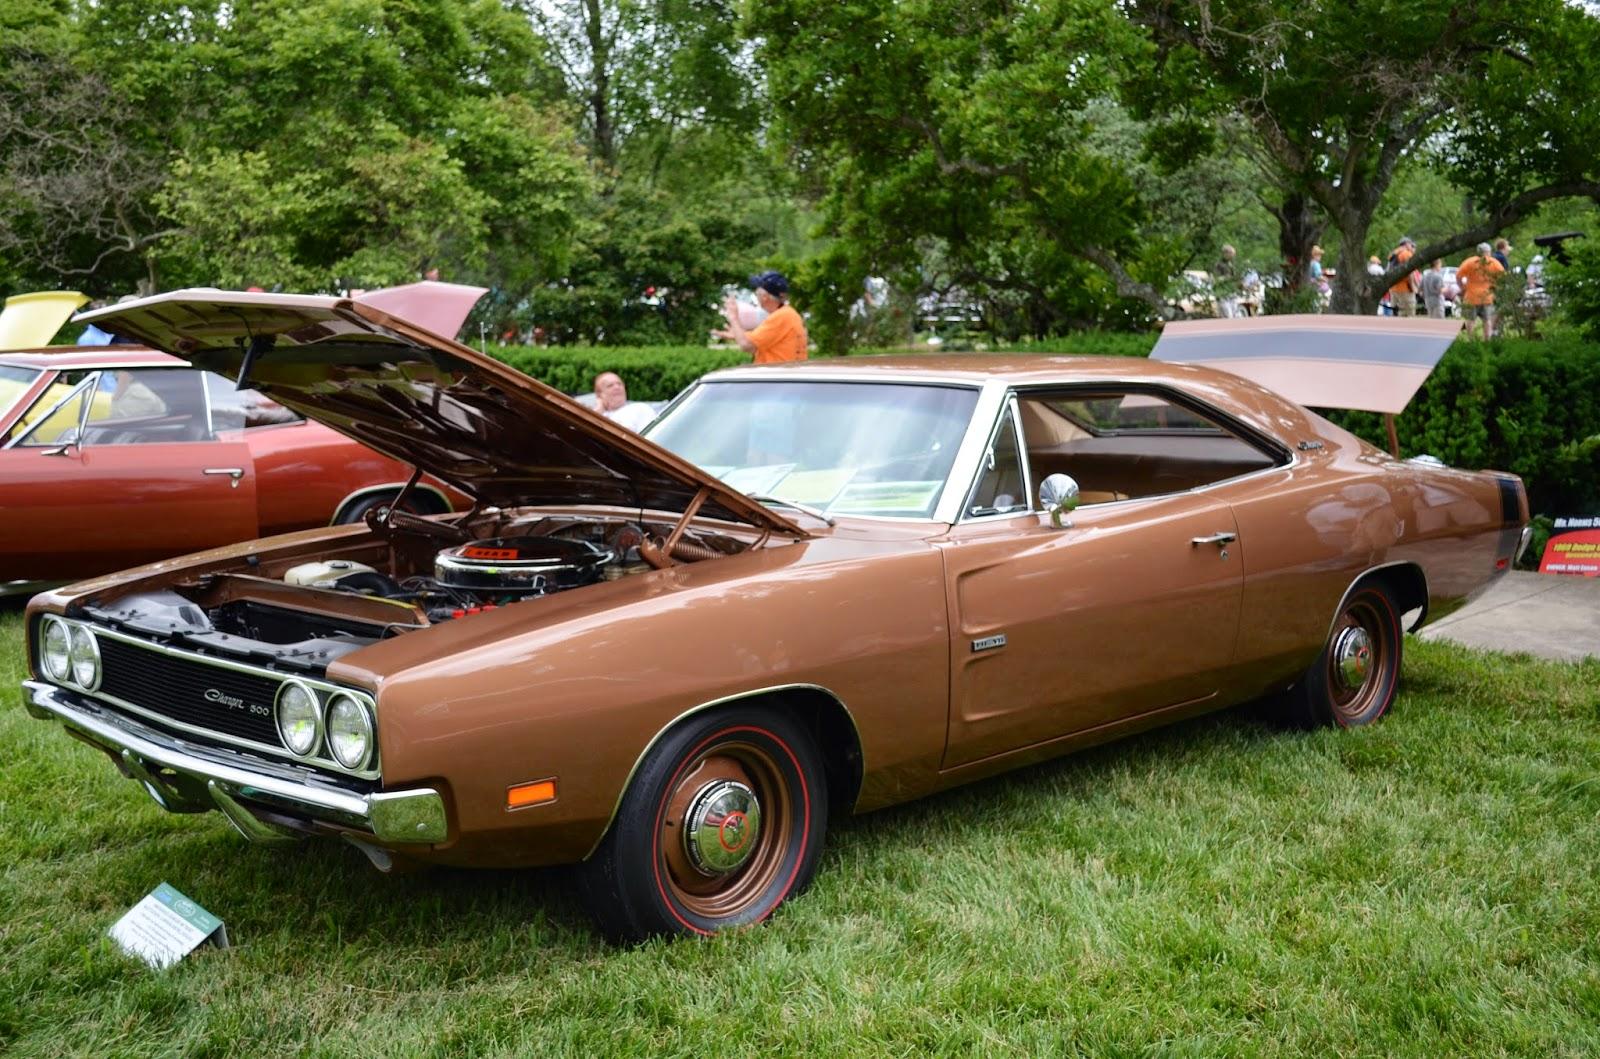 Turnerbudds Car Blog: American Muscle